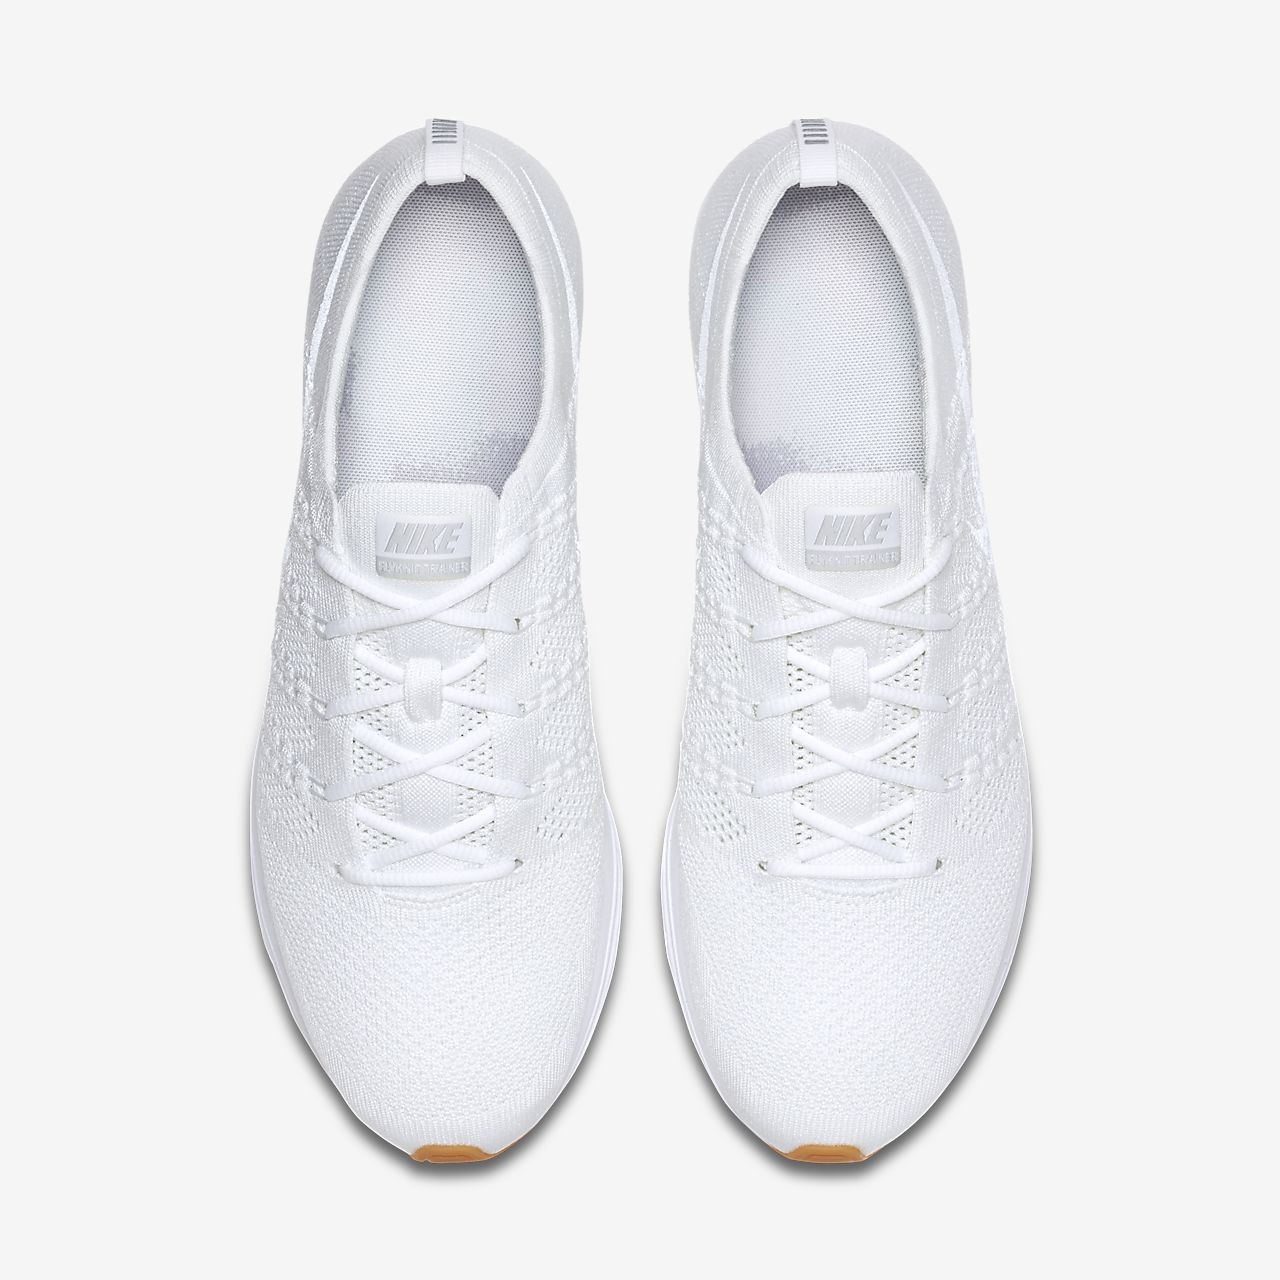 promo code 9b4c6 686c4 ... Nike Flyknit Trainer Unisex Shoe